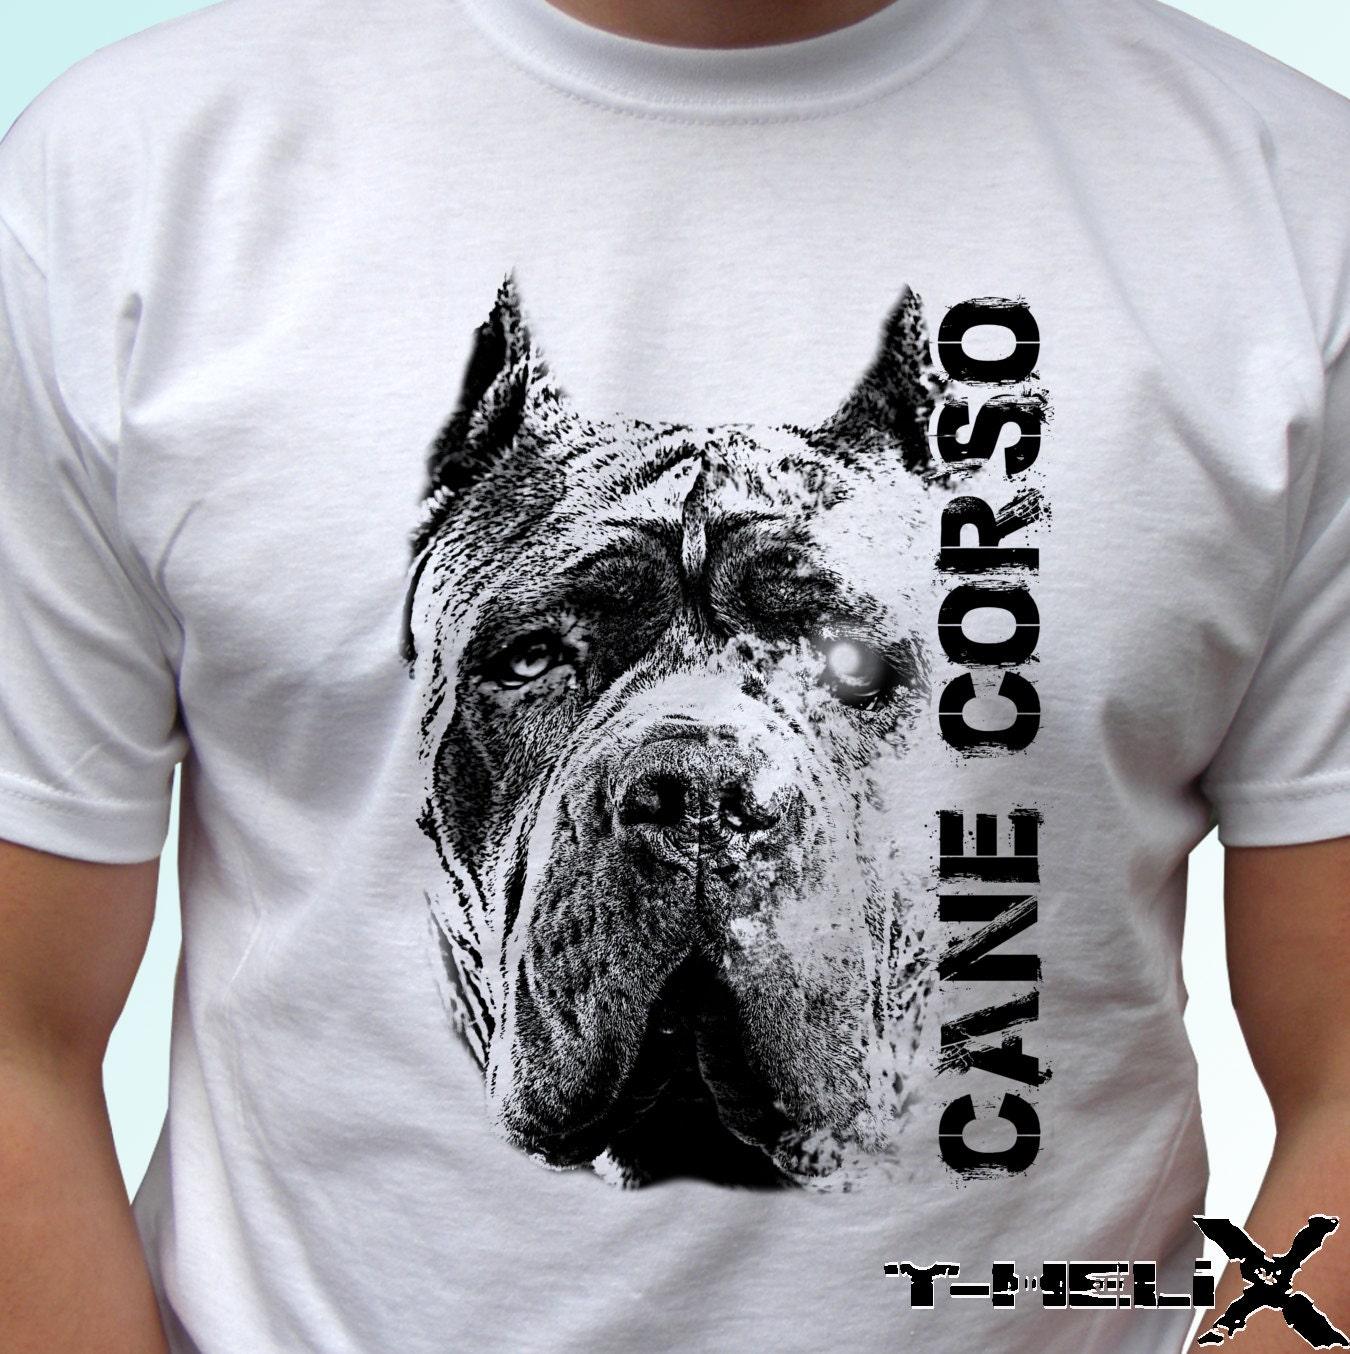 Shirt design new -  Zoom